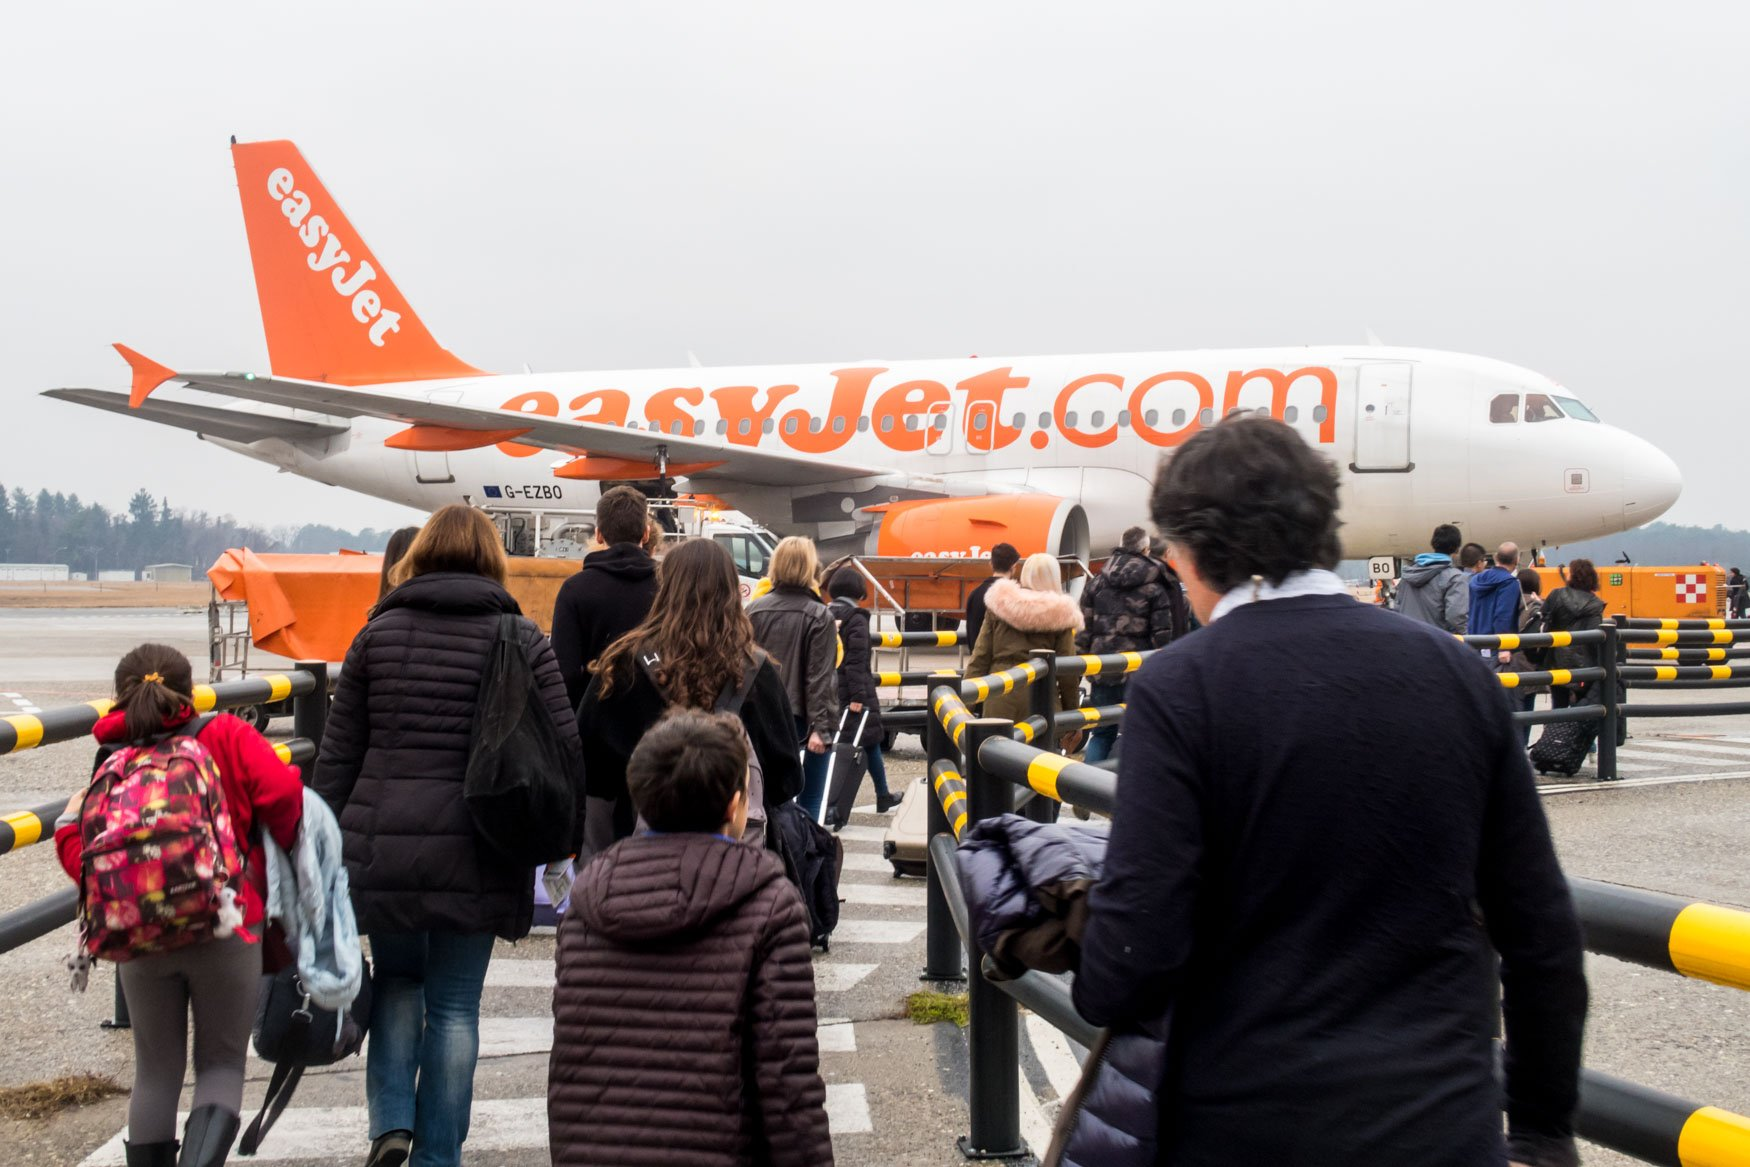 Boarding easyJet A319 at Milan Malpensa